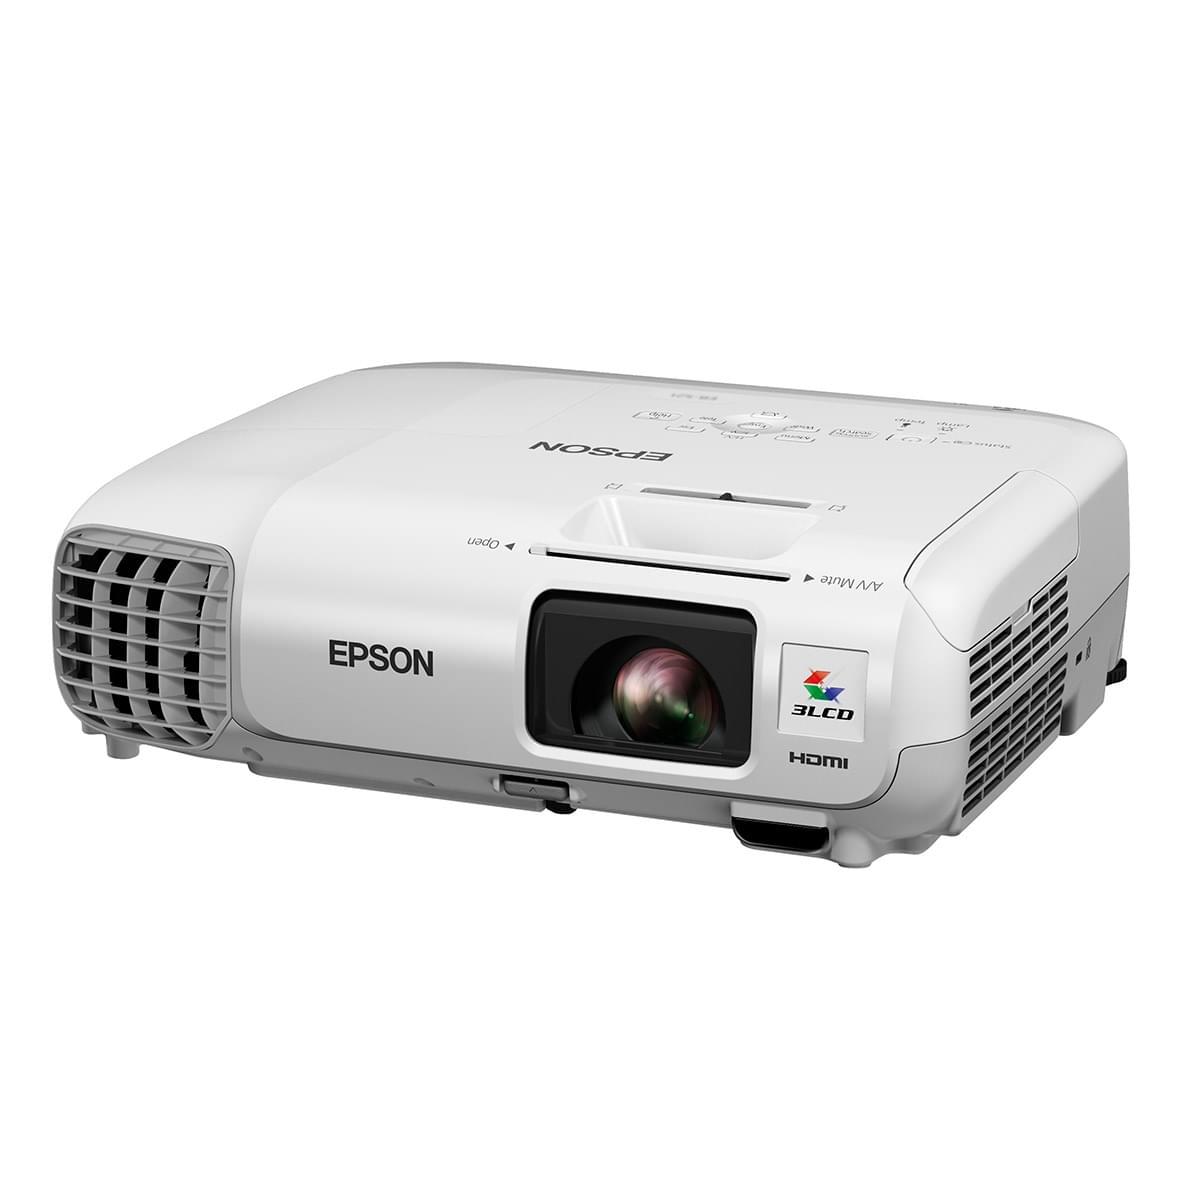 Epson EB-S17 - Vidéoprojecteur Epson - Cybertek.fr - 0